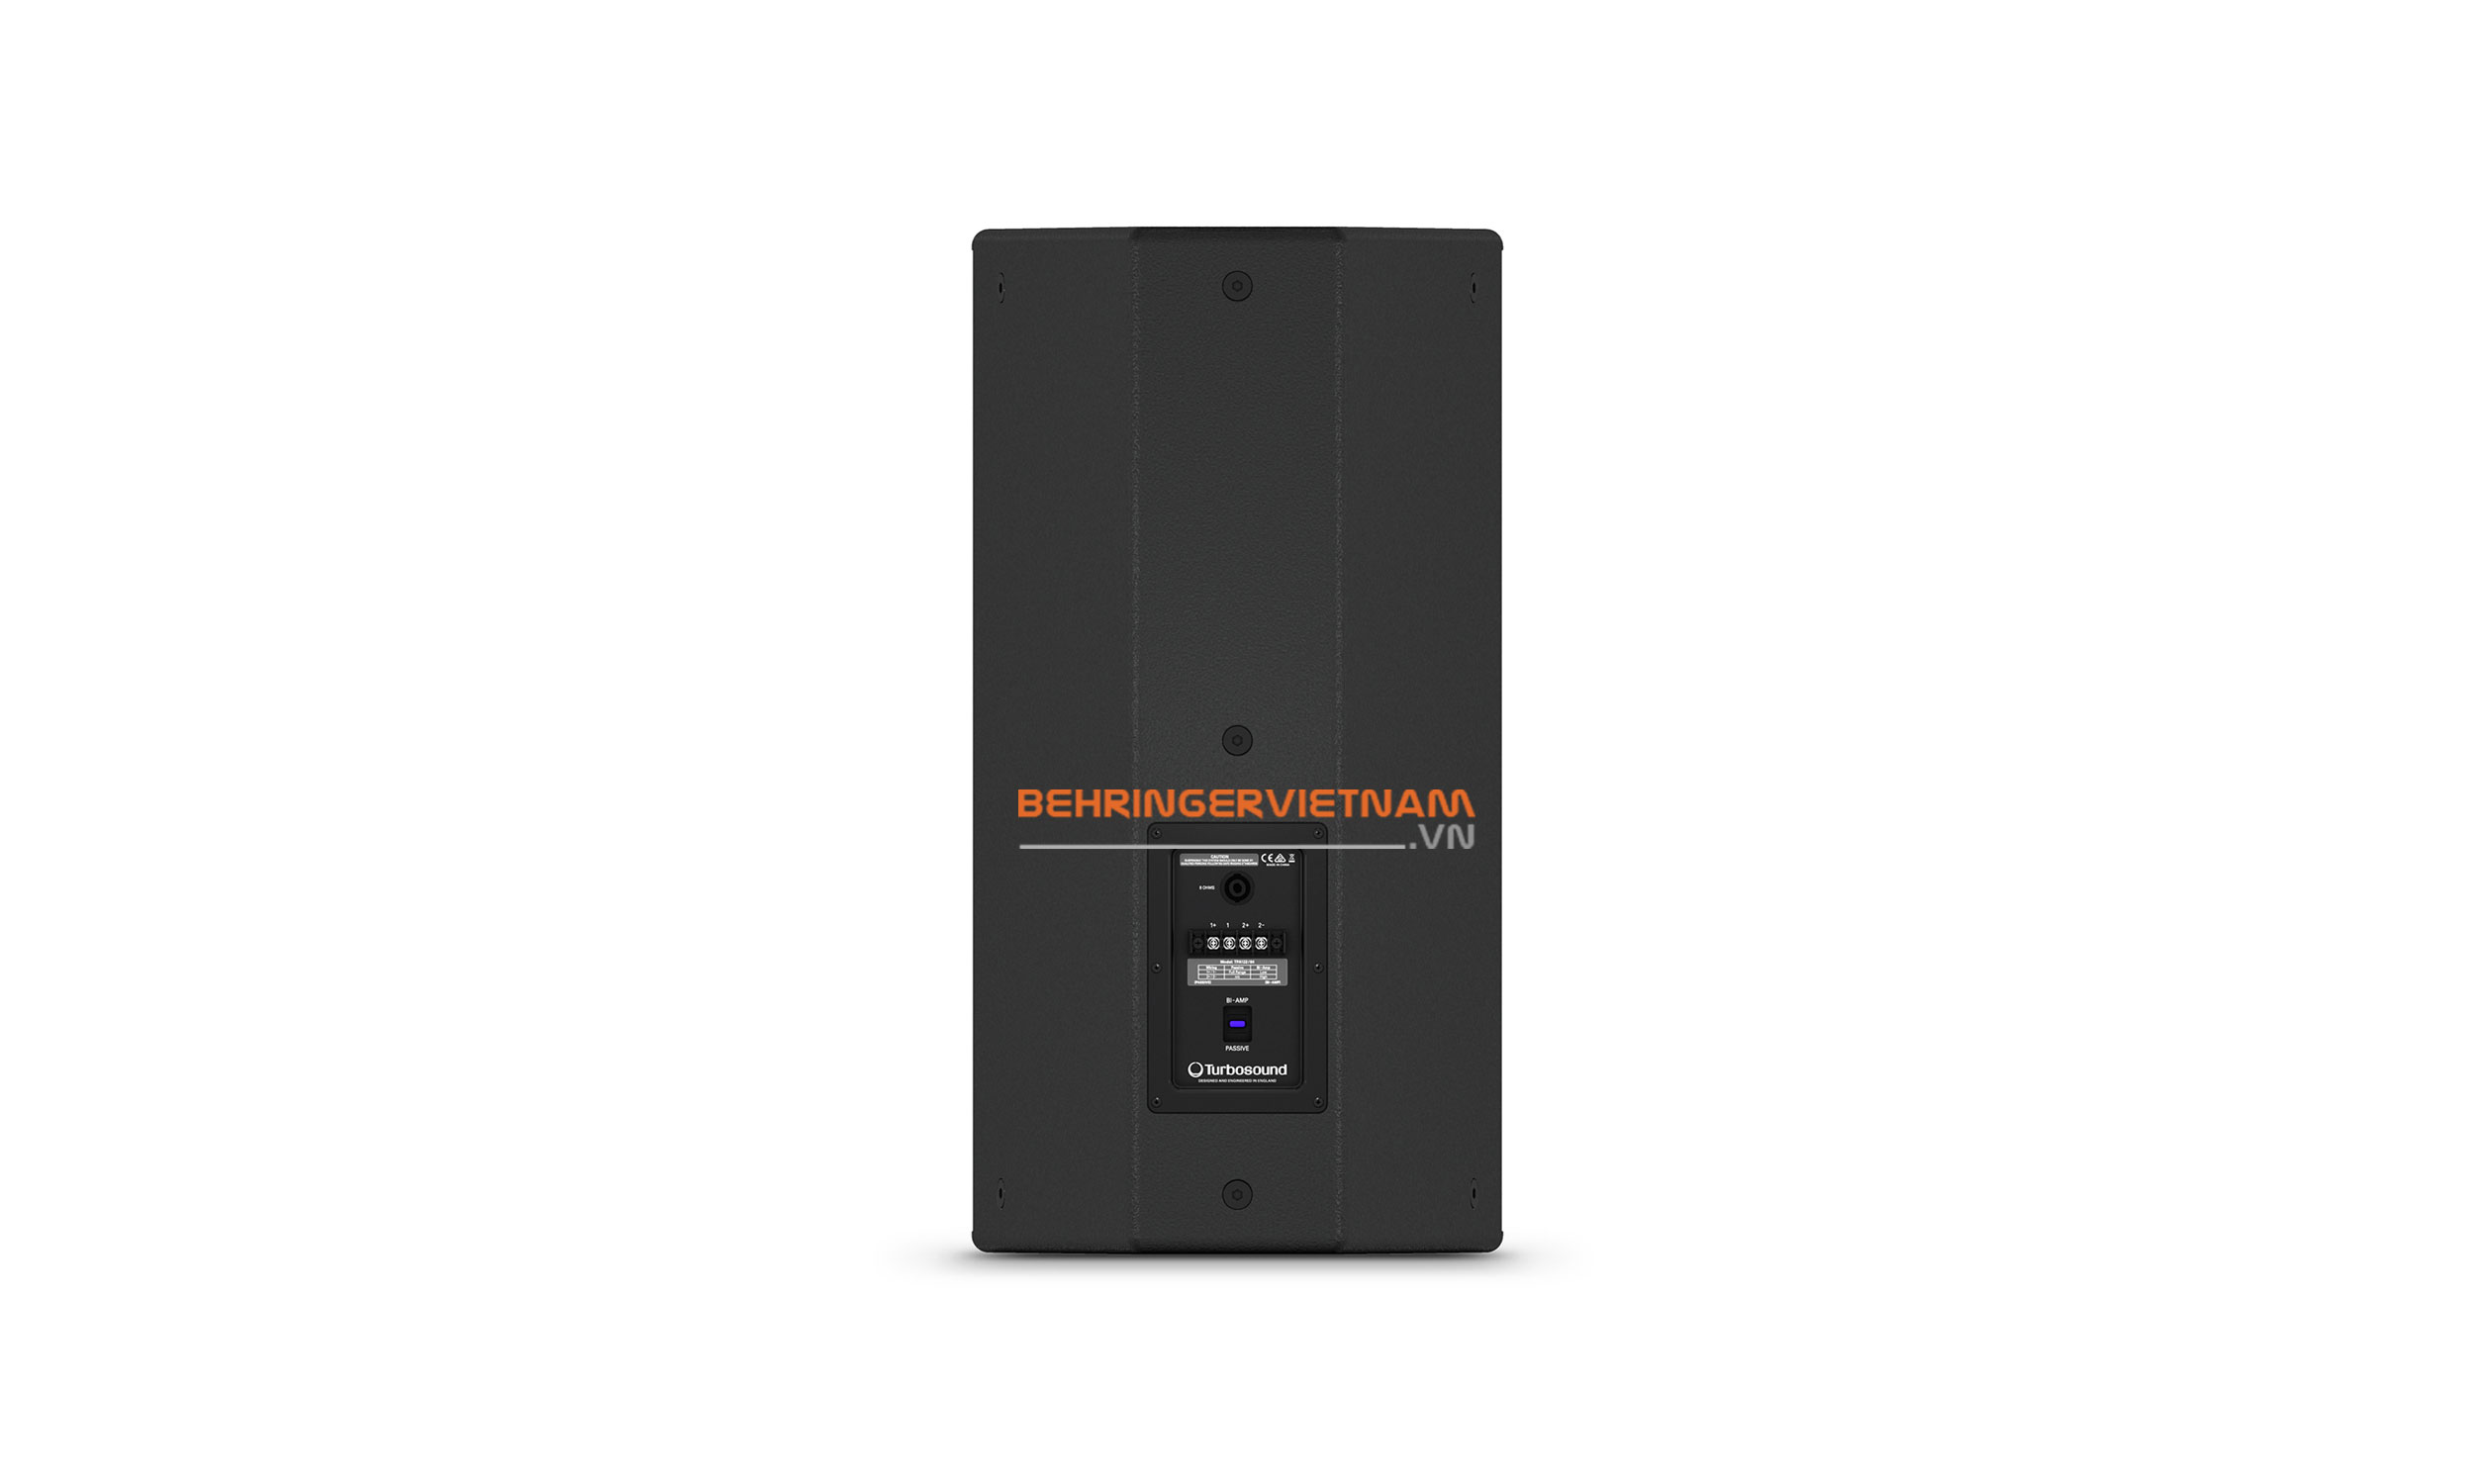 Tms152 portable speakers loudspeaker systems turbosound - Loa Turbosound Madrid Tms152 Turbosound Madrid Tms152